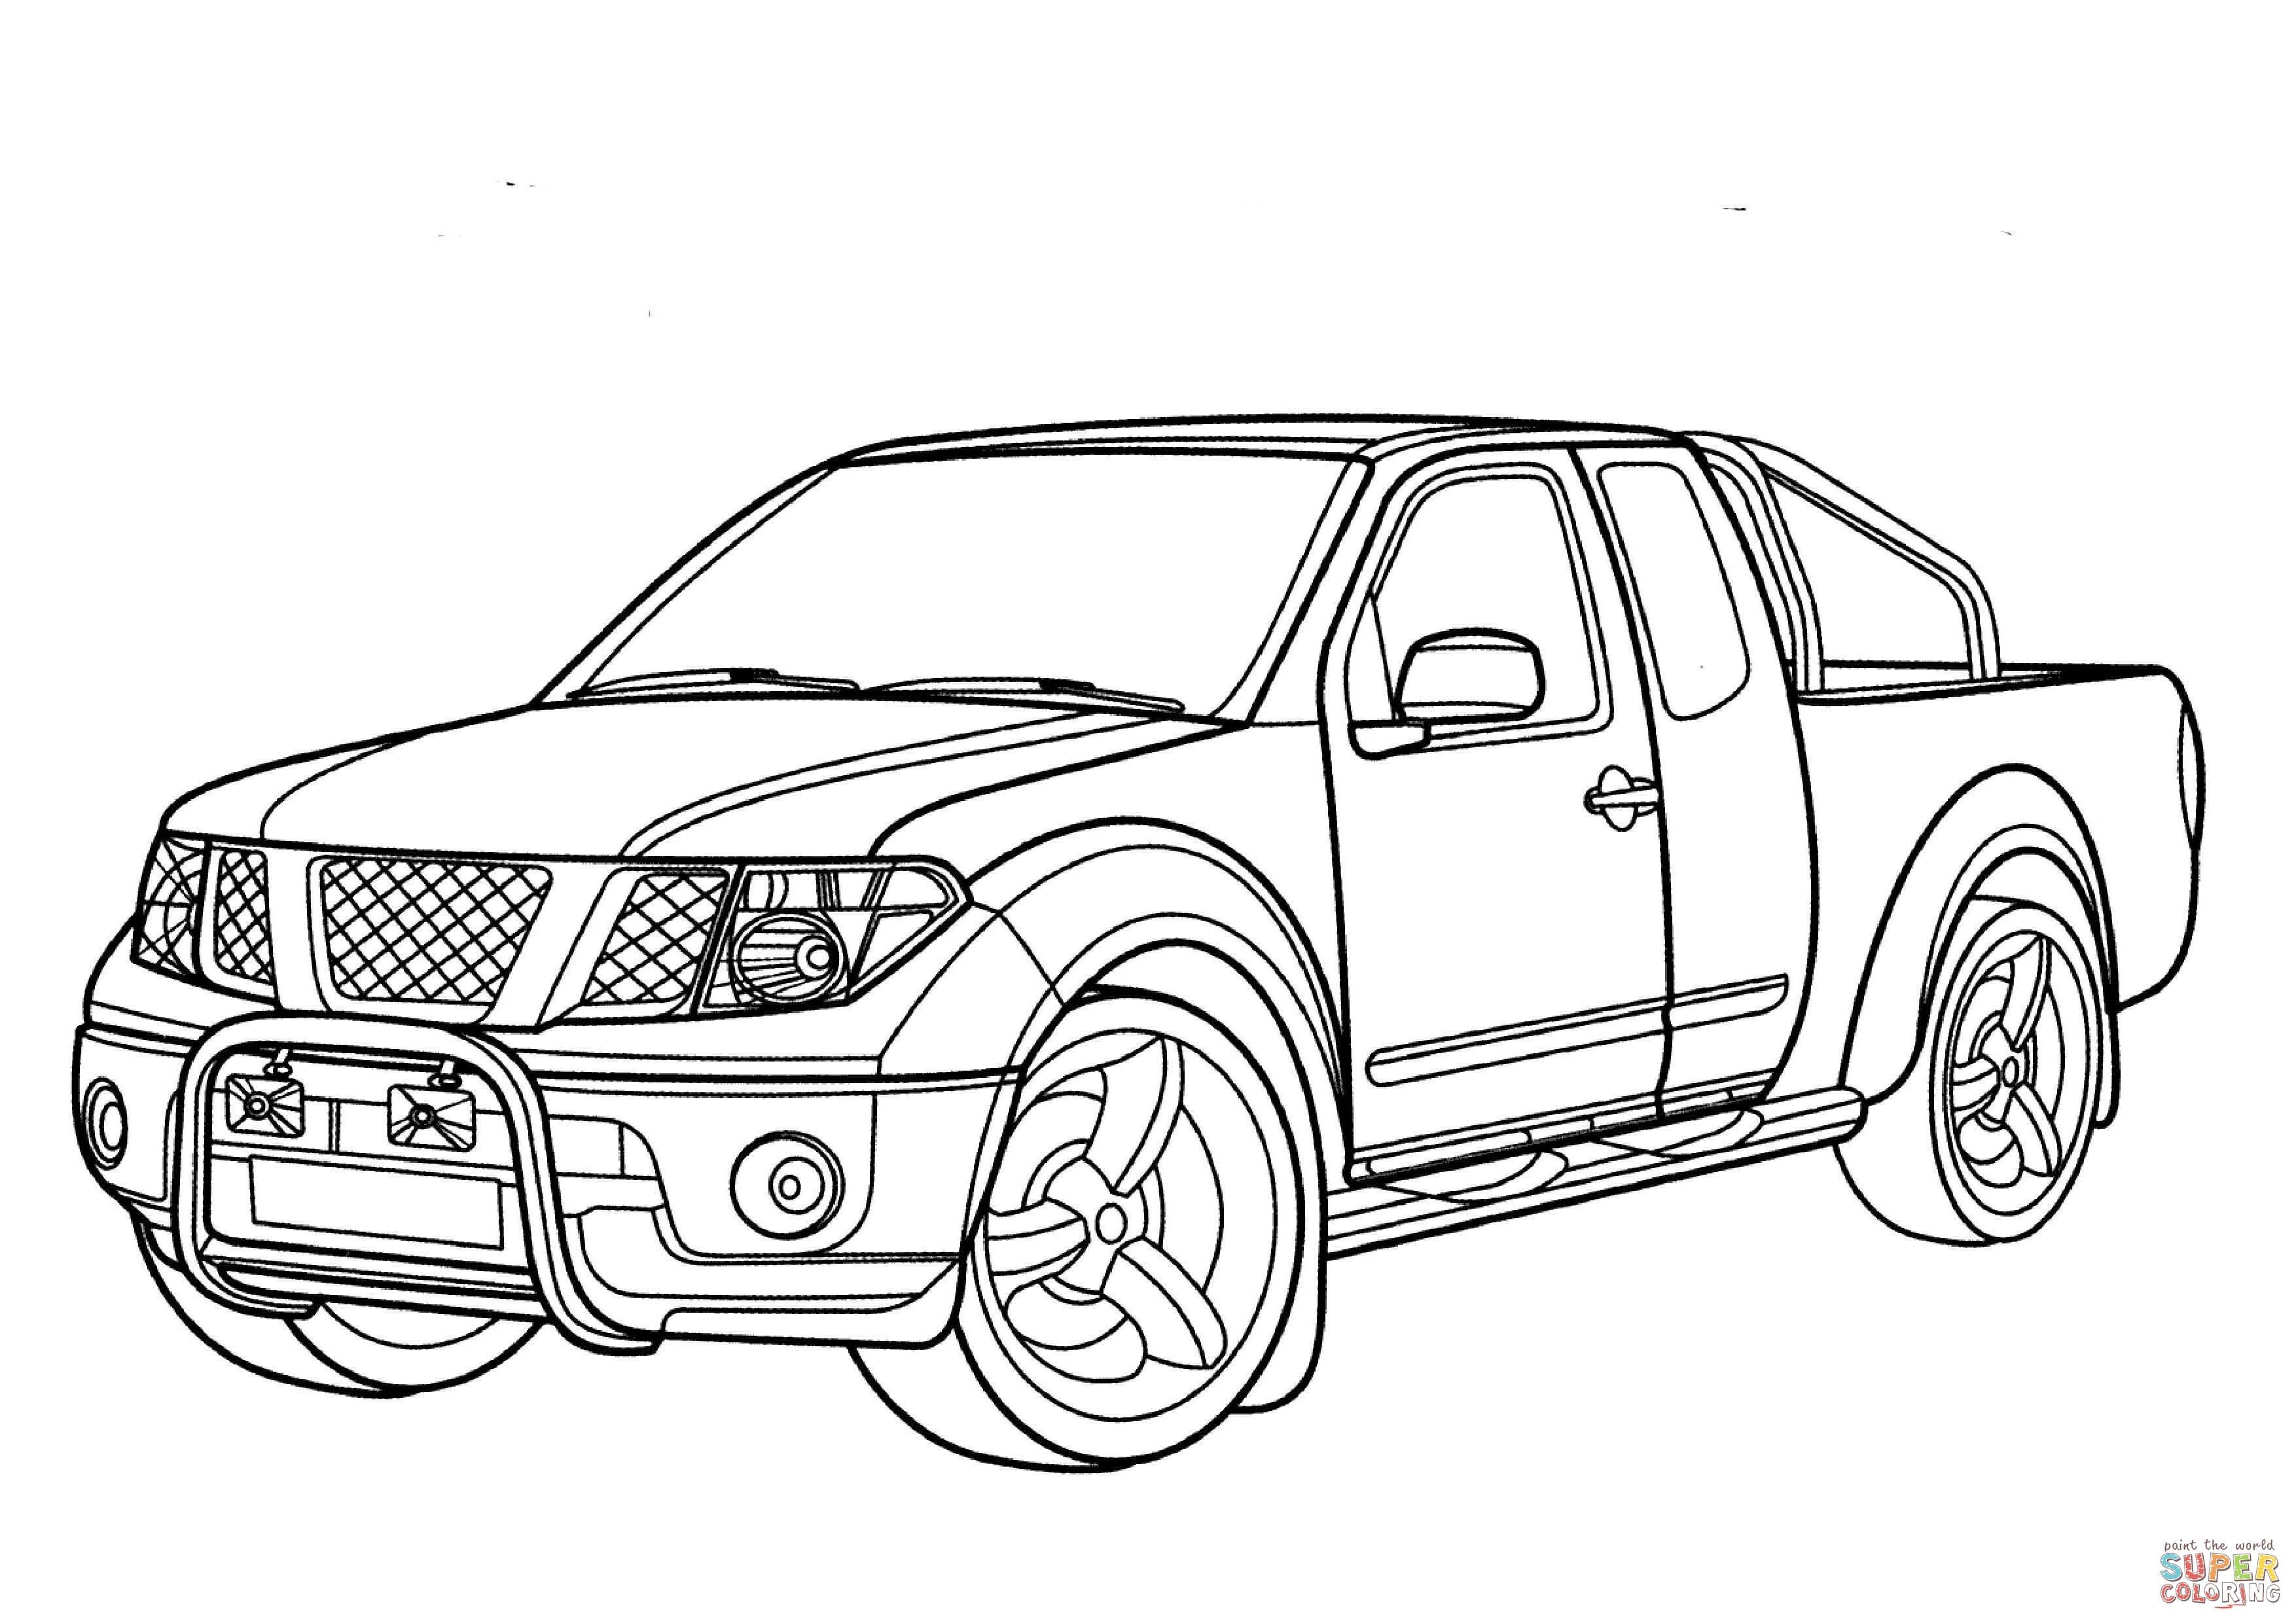 Dibujo De Nissan Navara Para Colorear